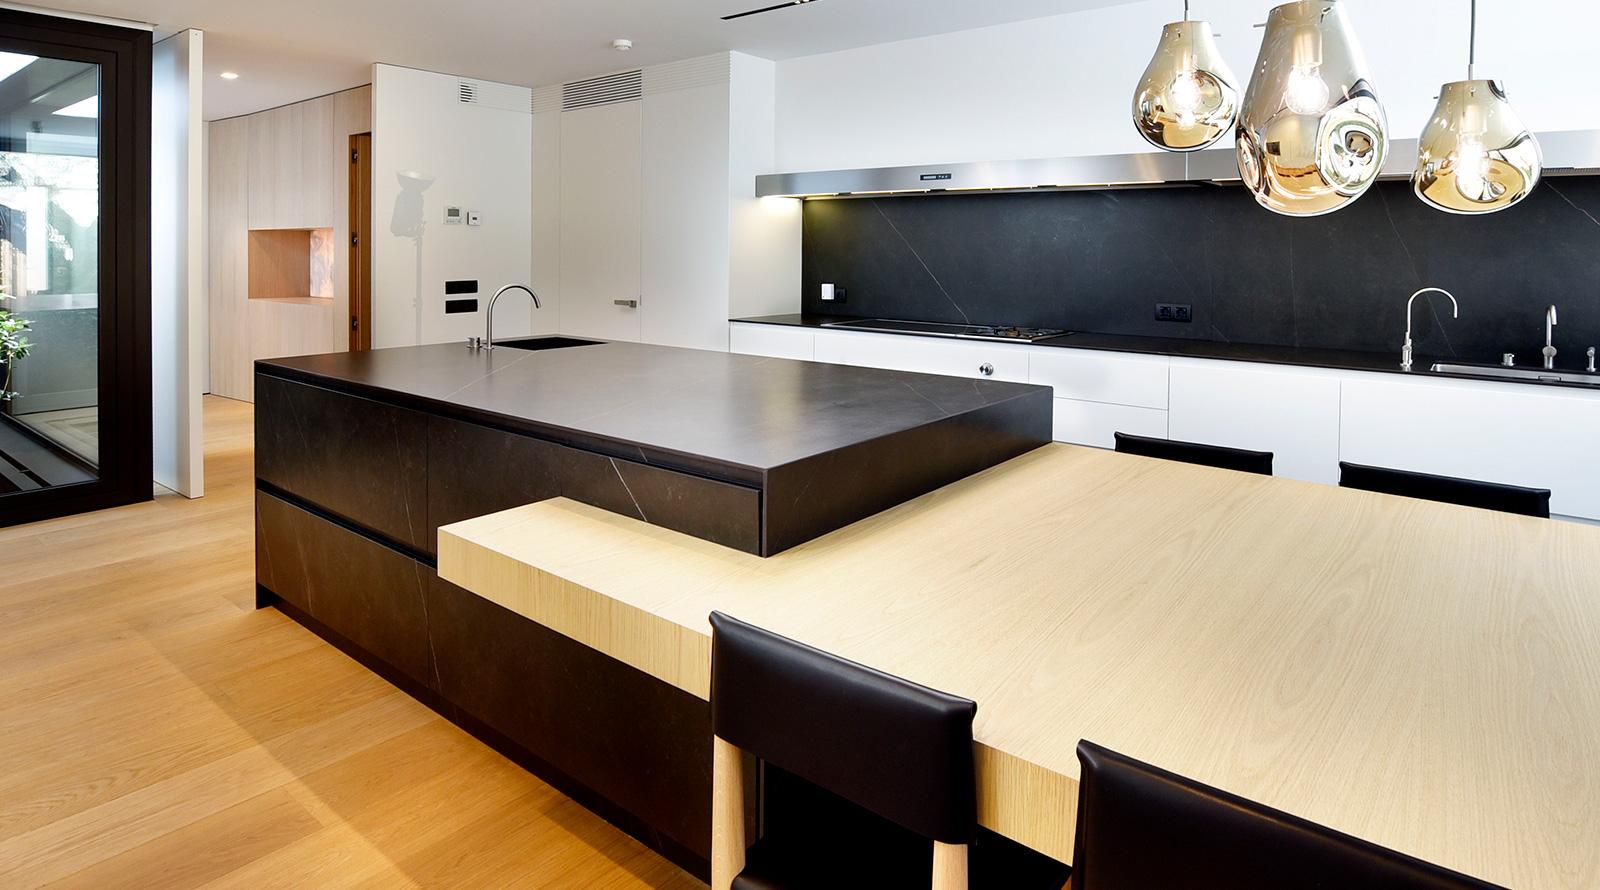 Empresas de cocina en Barcelona